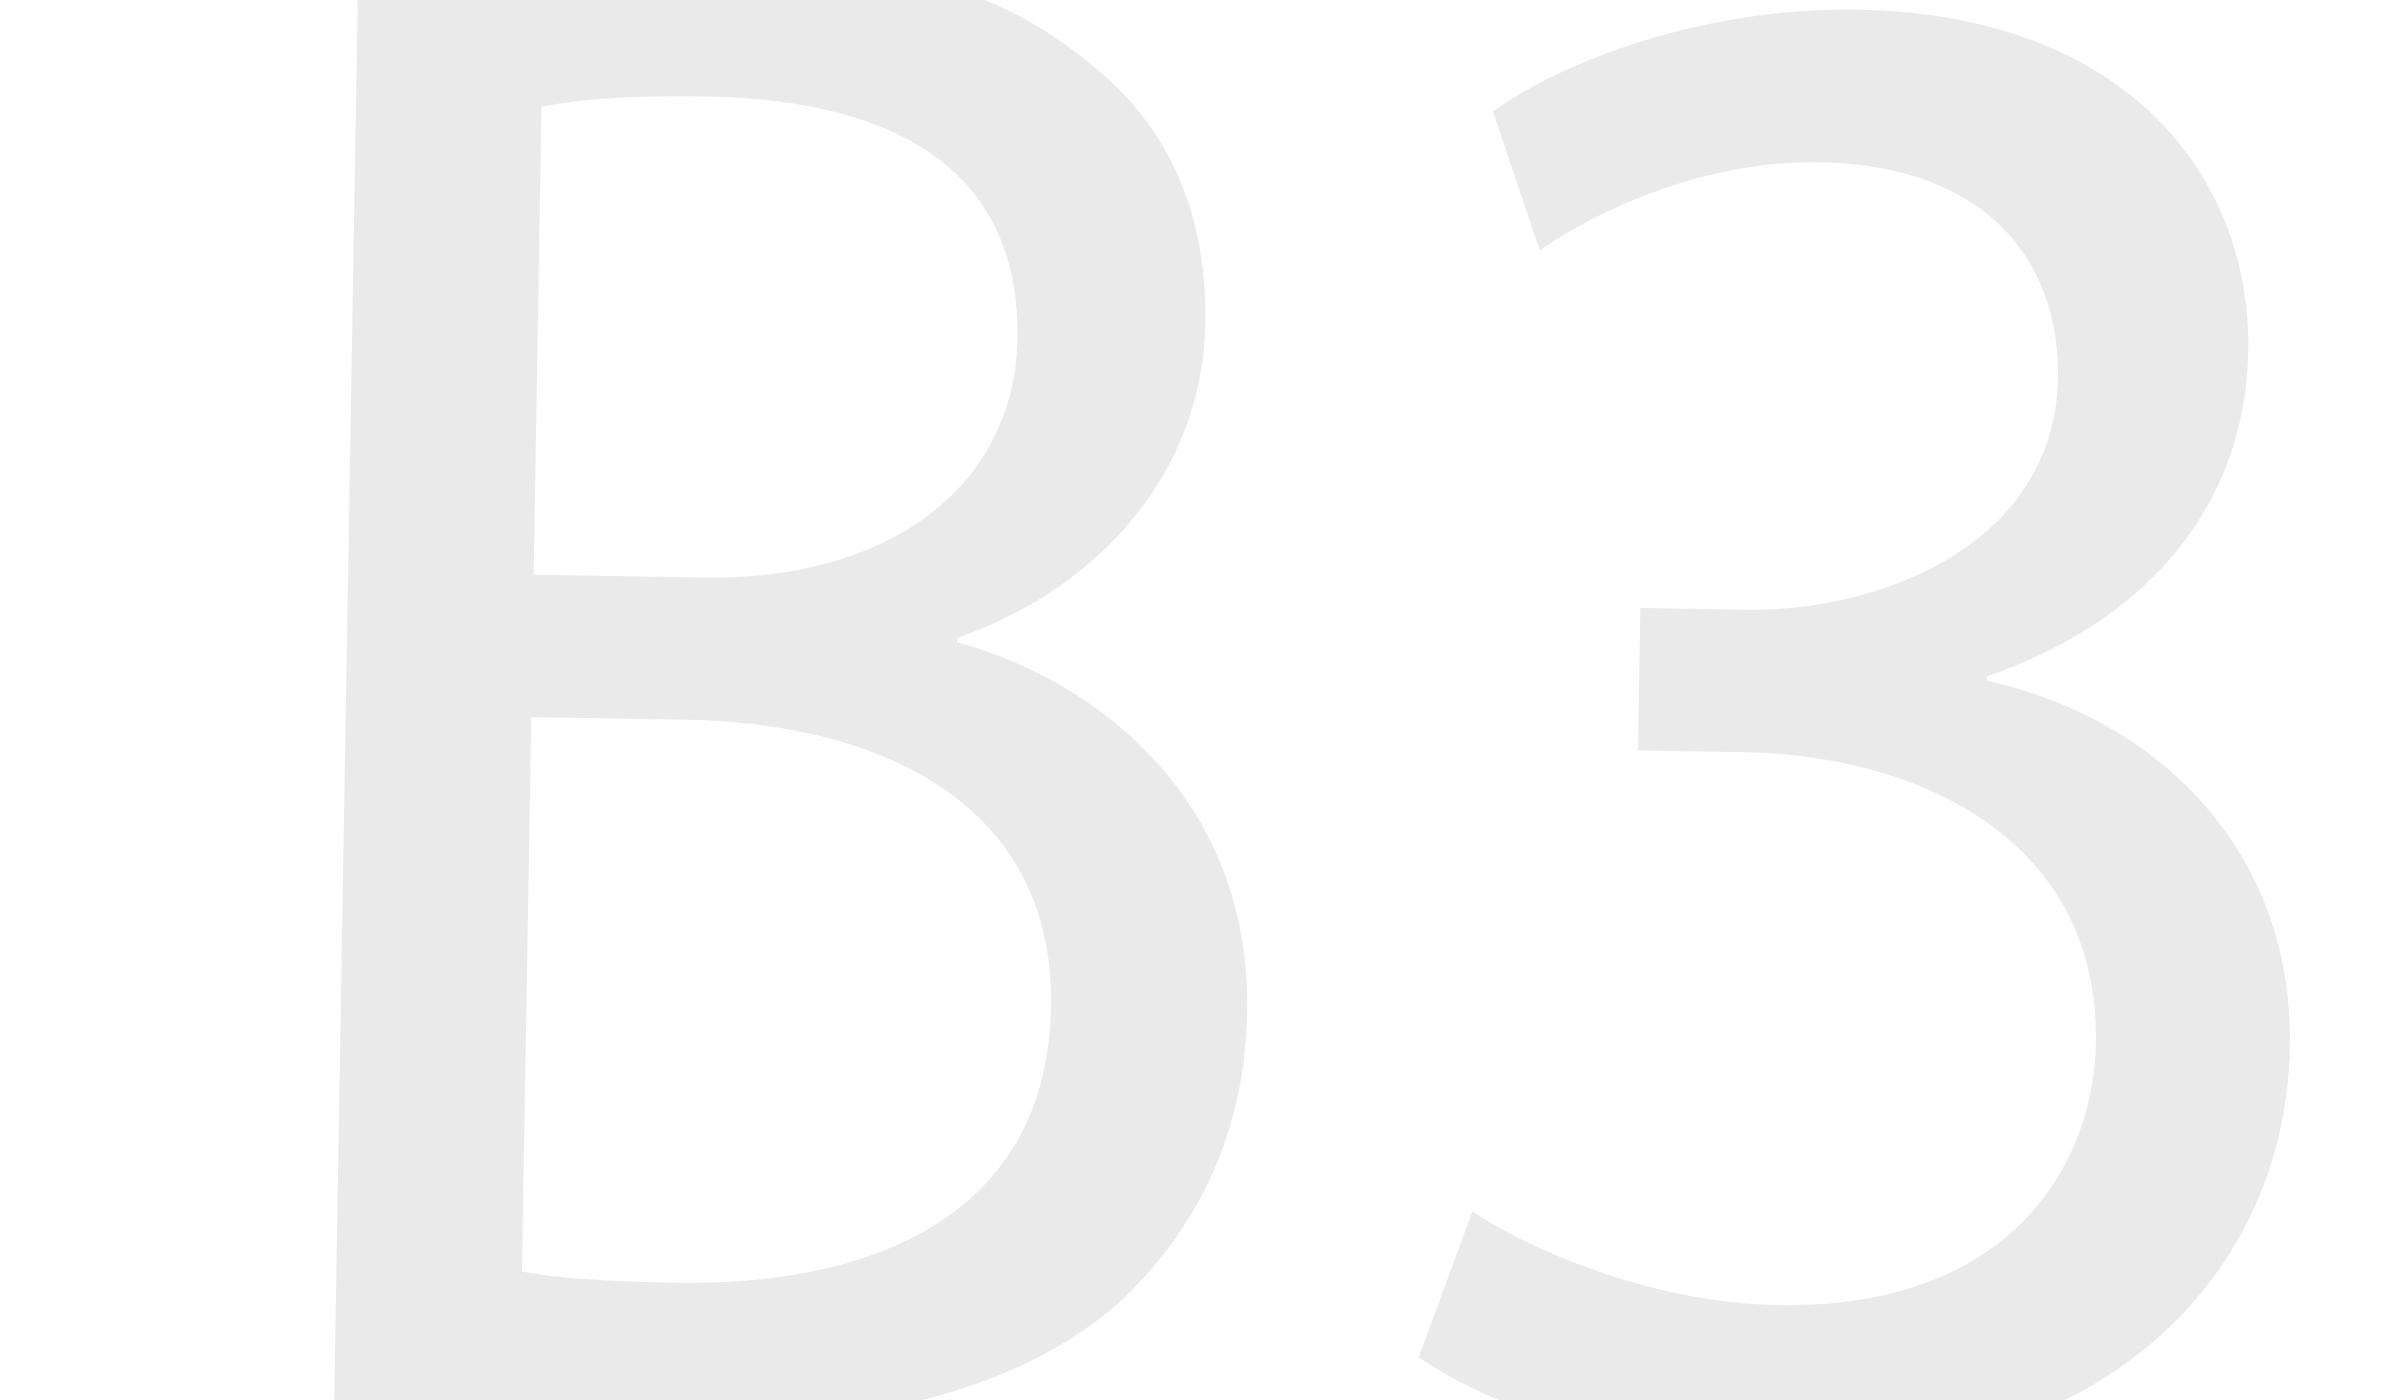 backb3